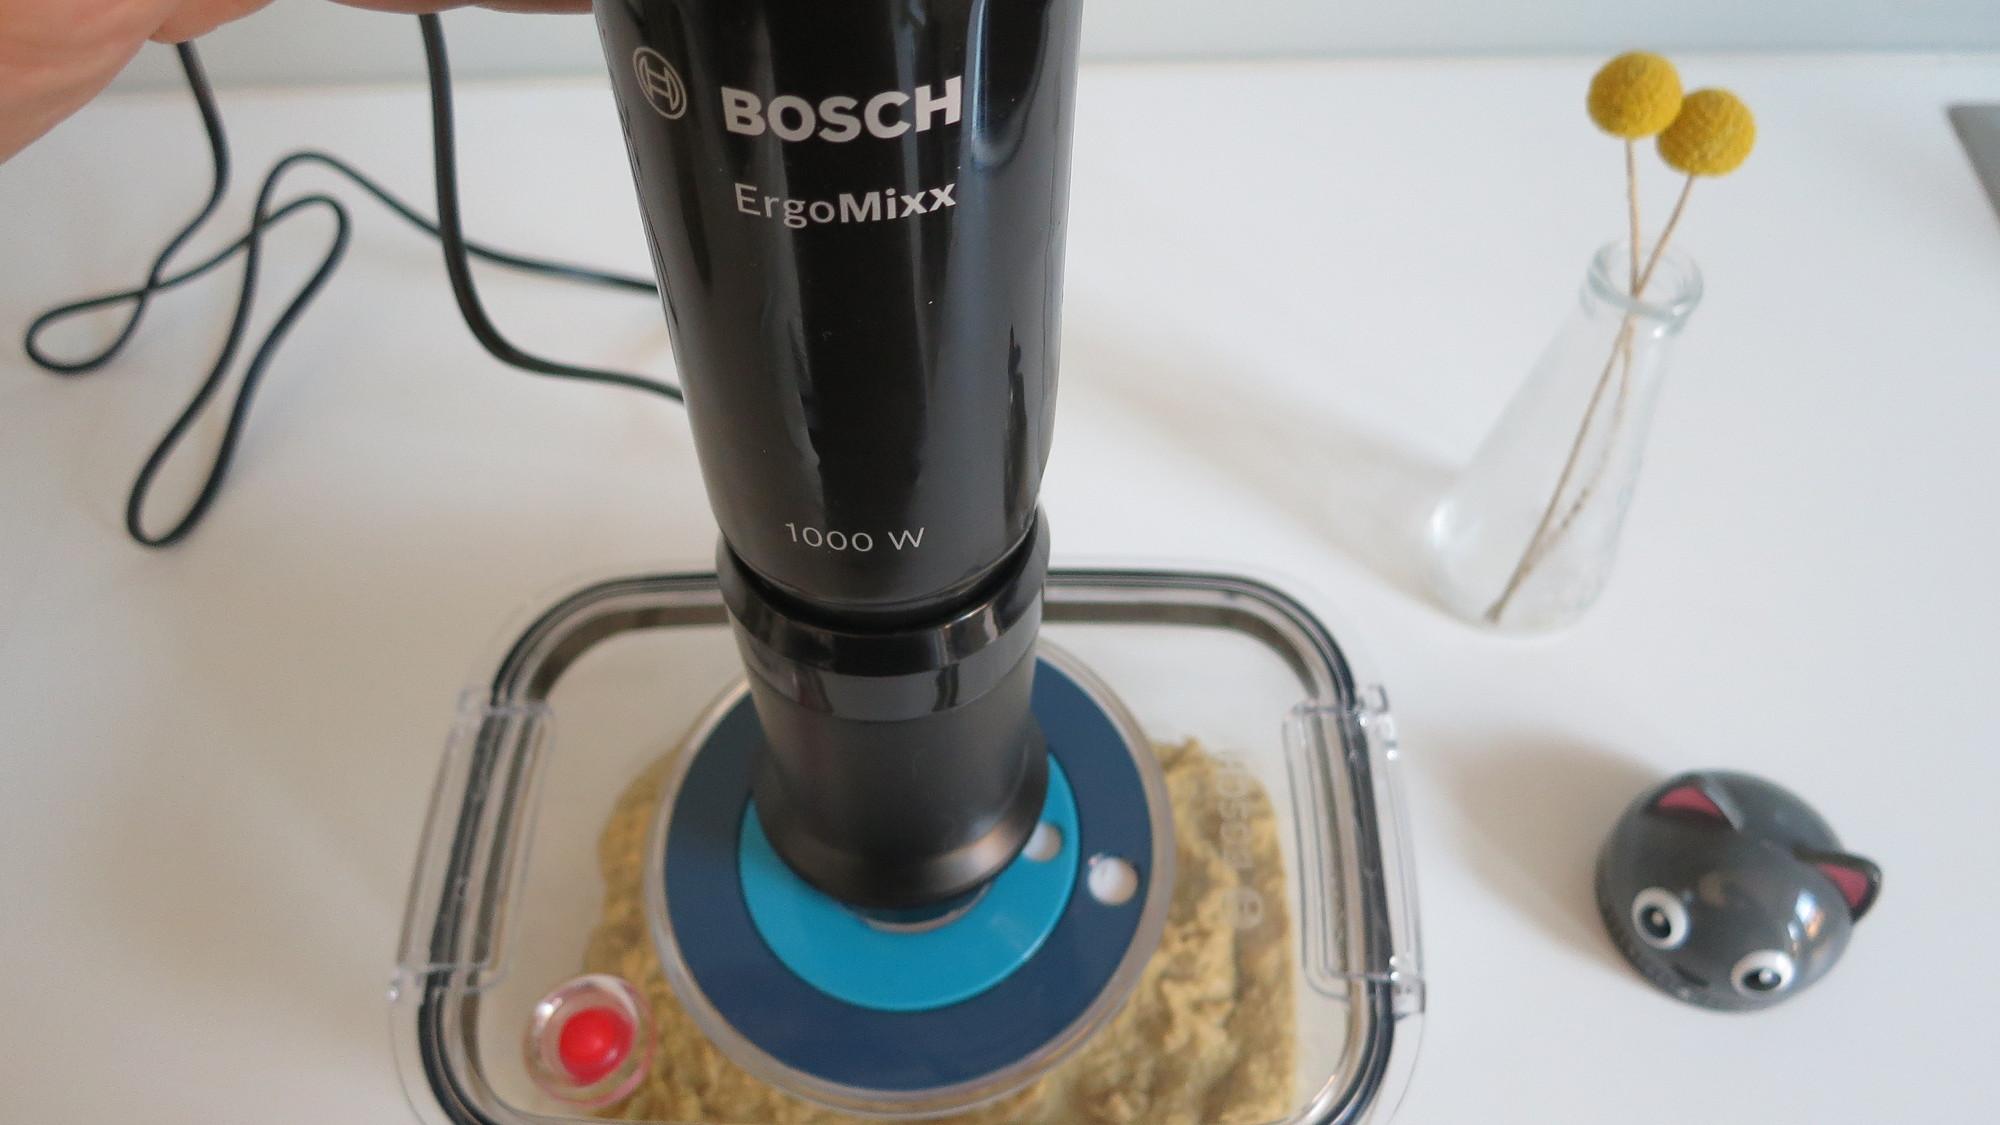 Stabmixer Bosch ErgoMixx mit Vakuumpumpe